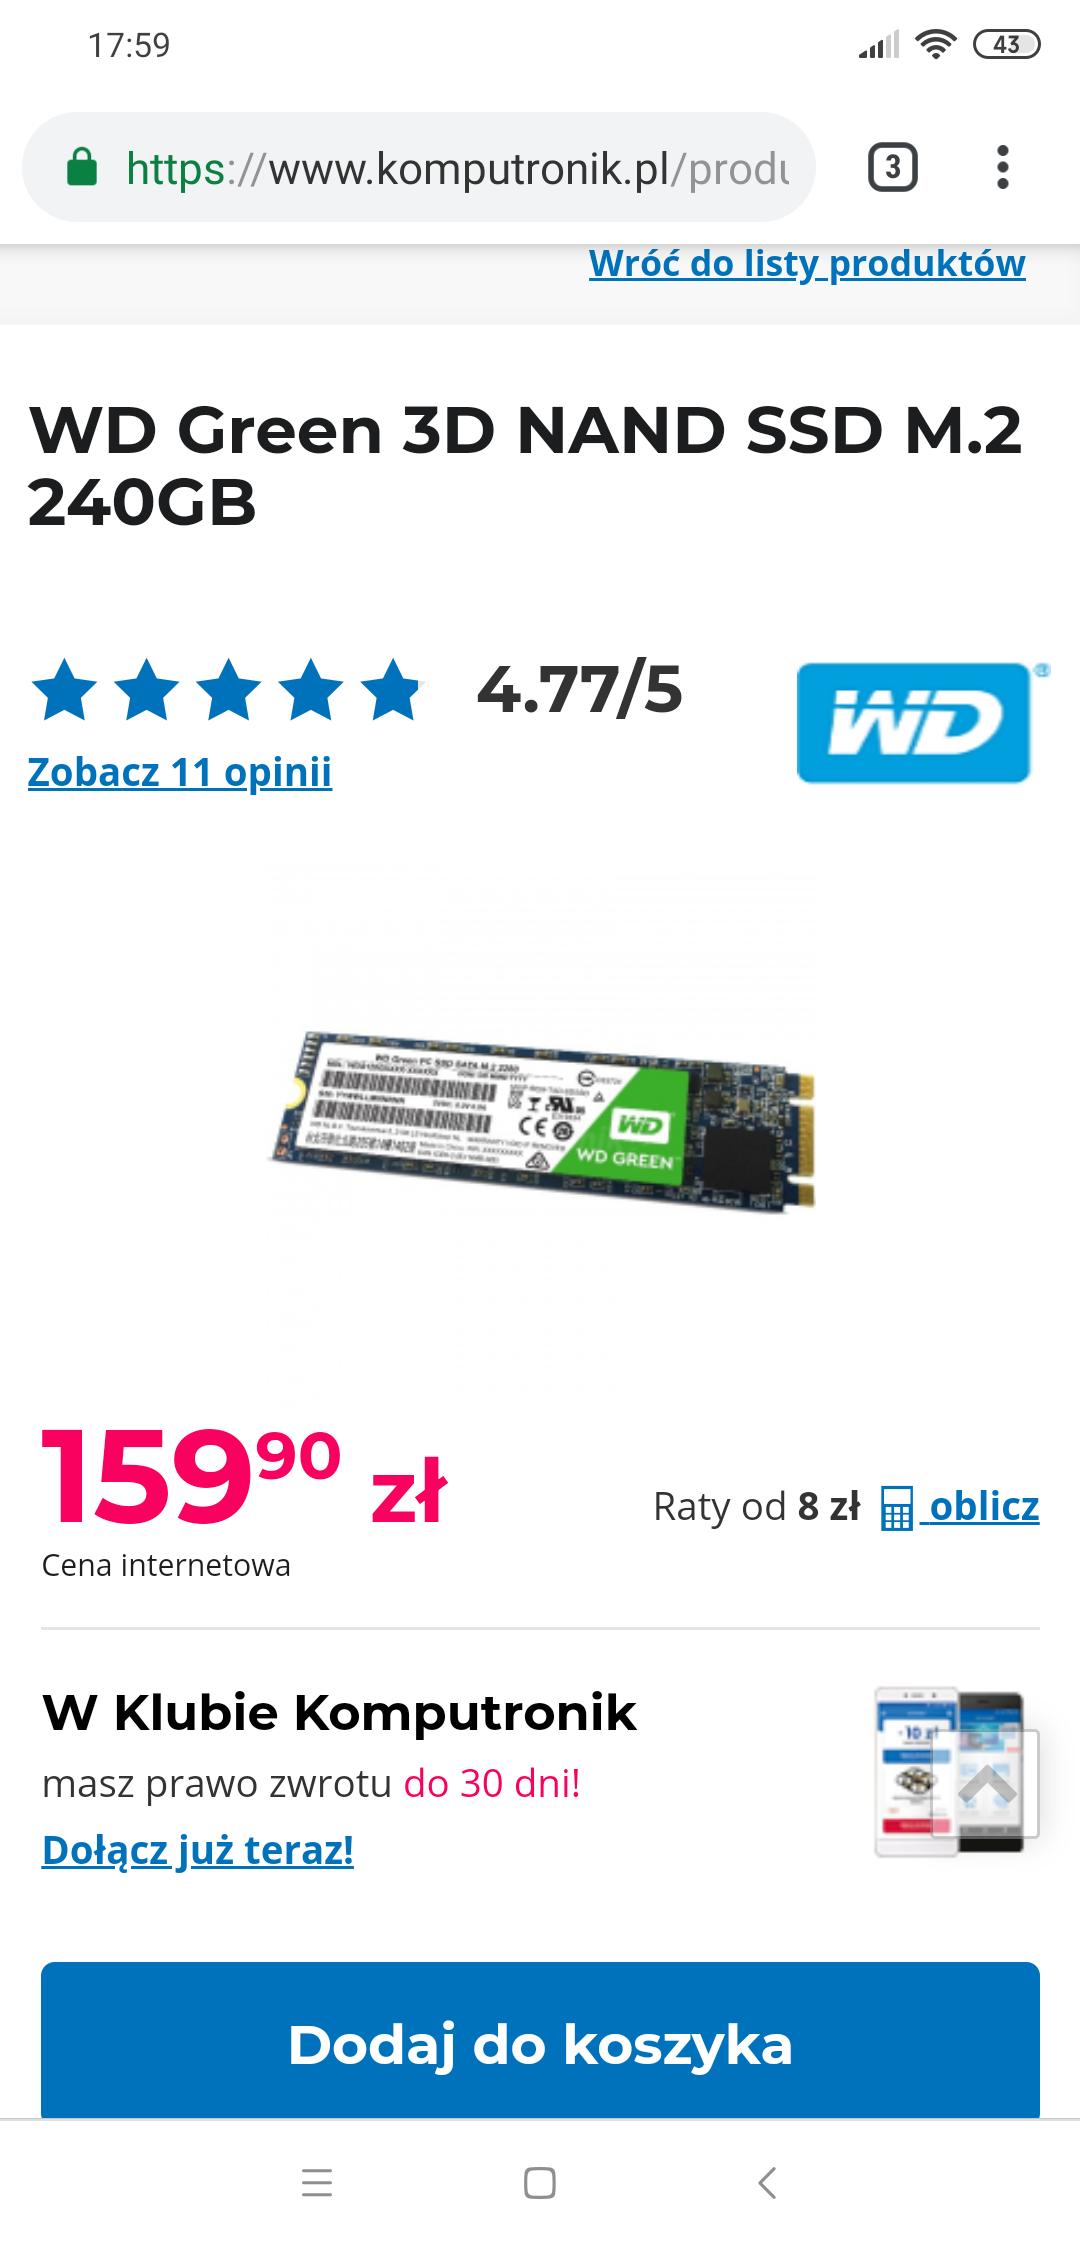 Dysk SSD WD Green 3D NAND SSD M.2 240GB